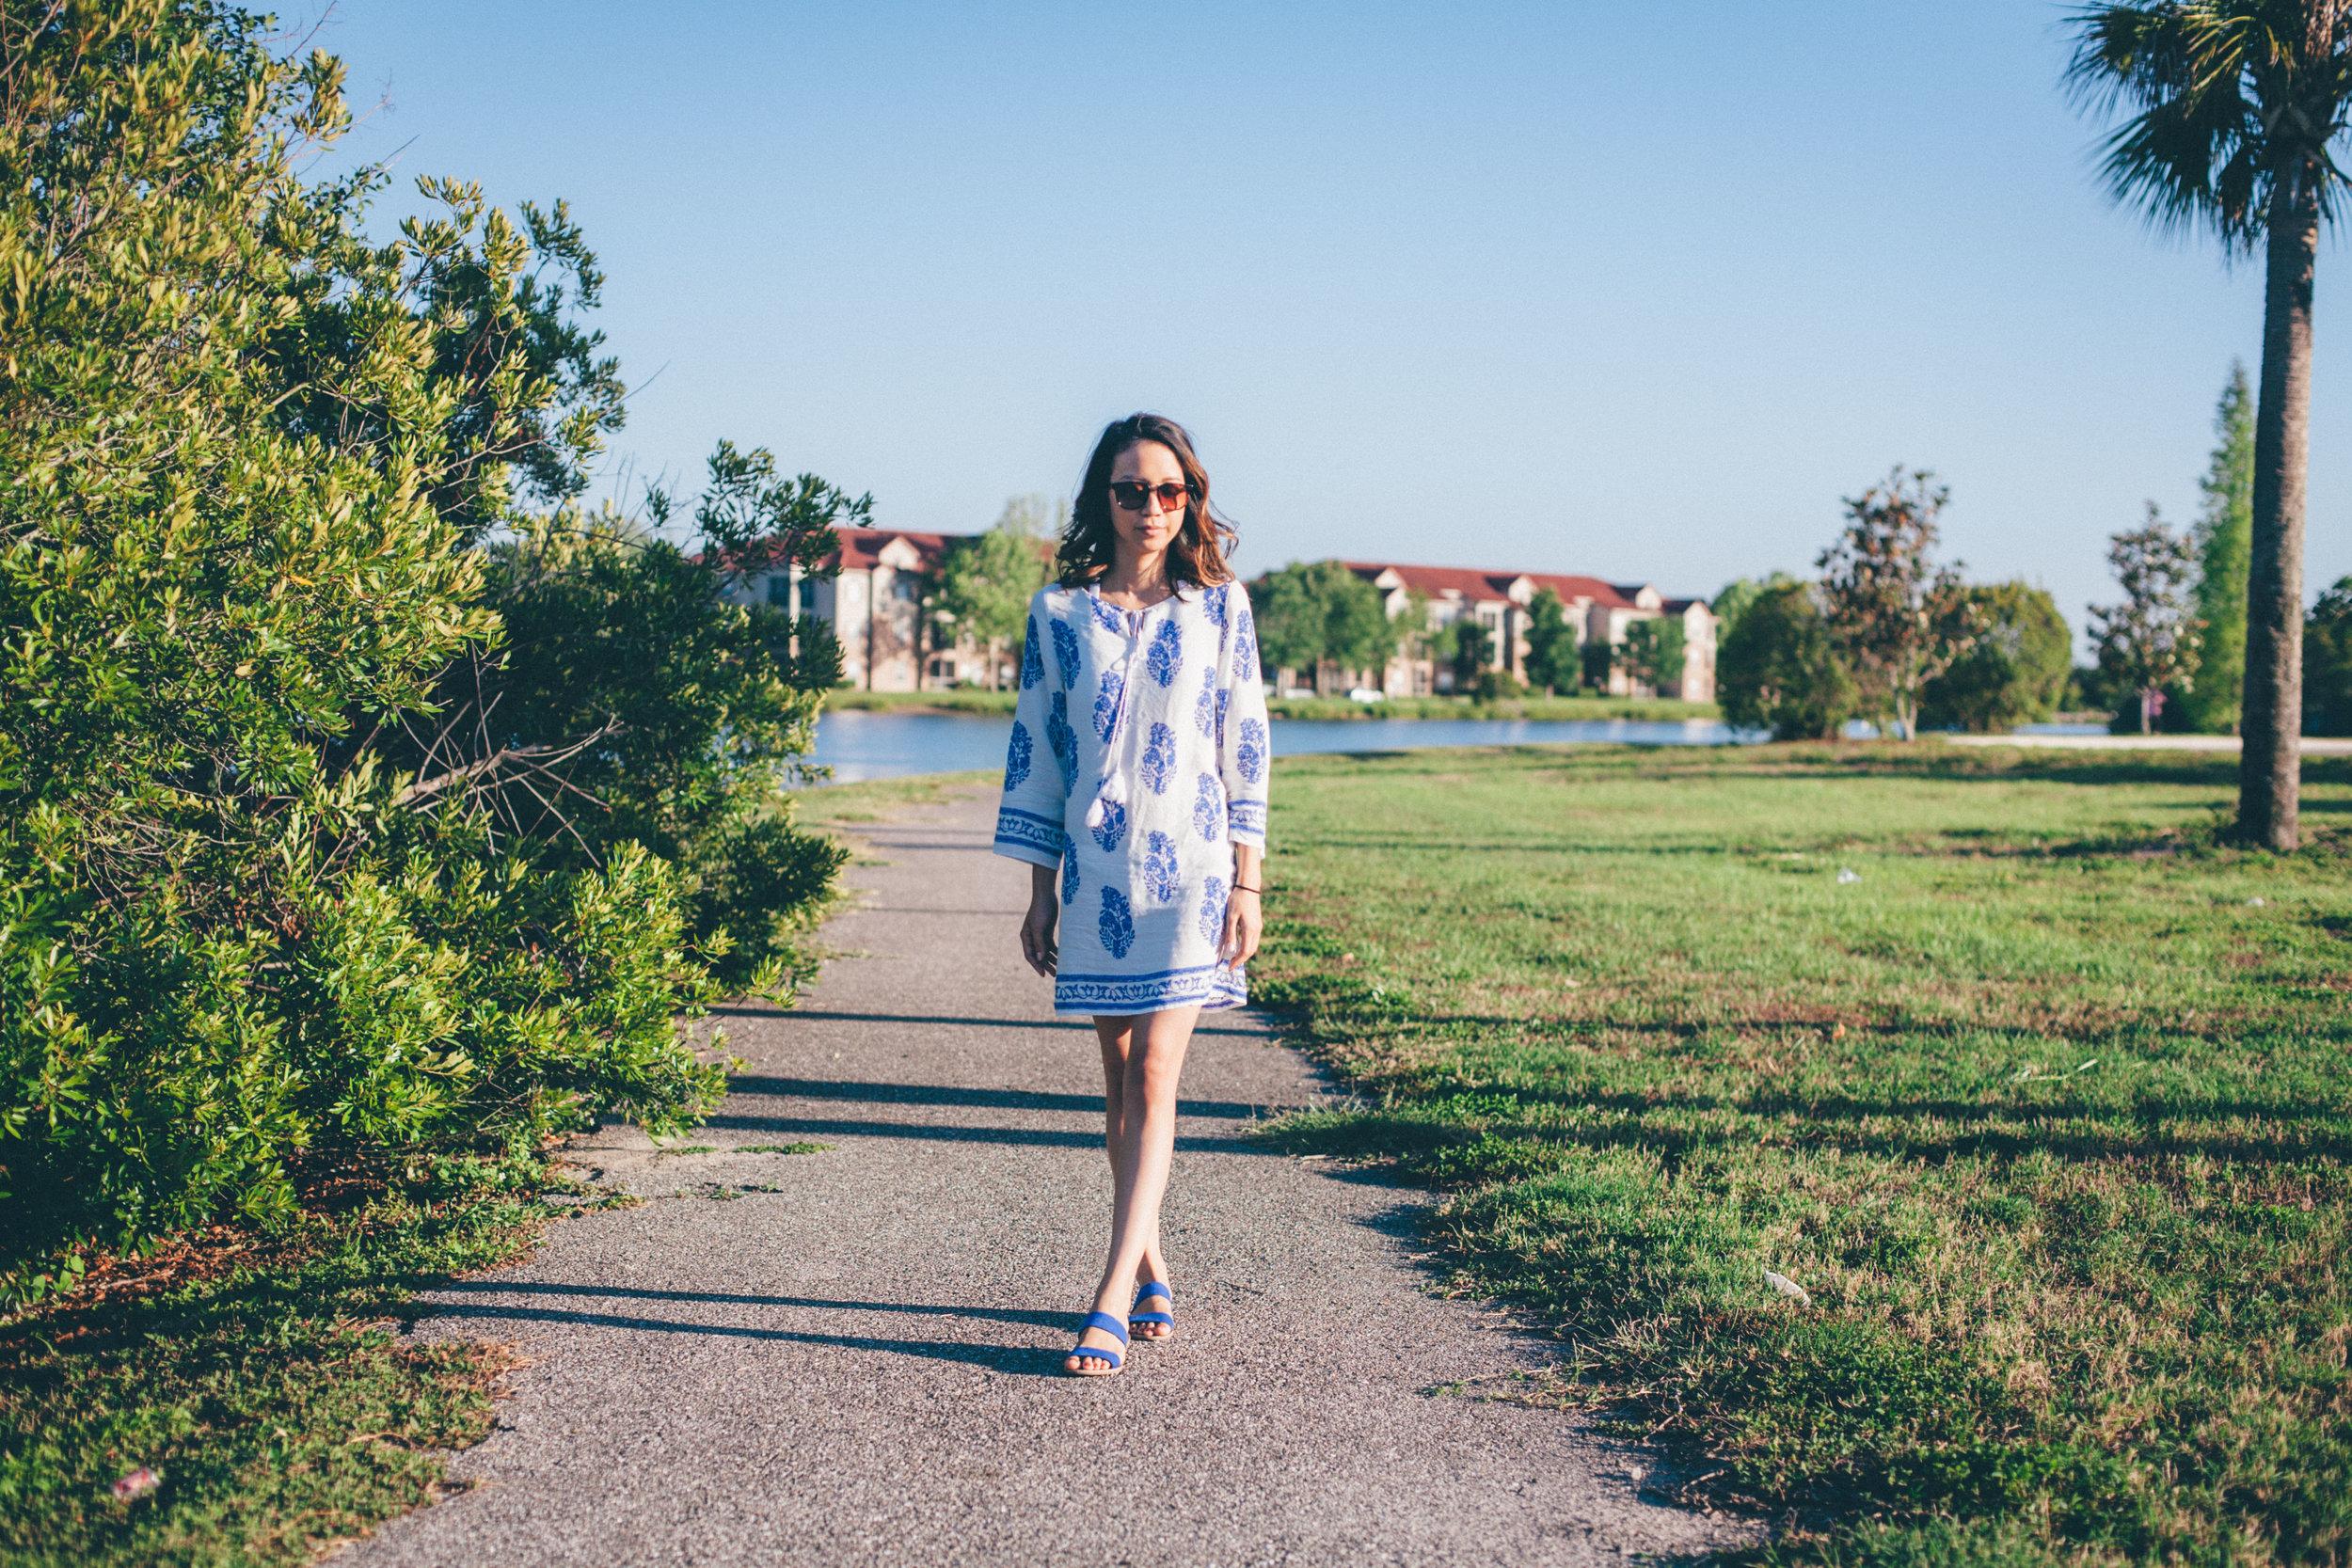 This Jenn Girl - Make Me Chic Shift Dress 5